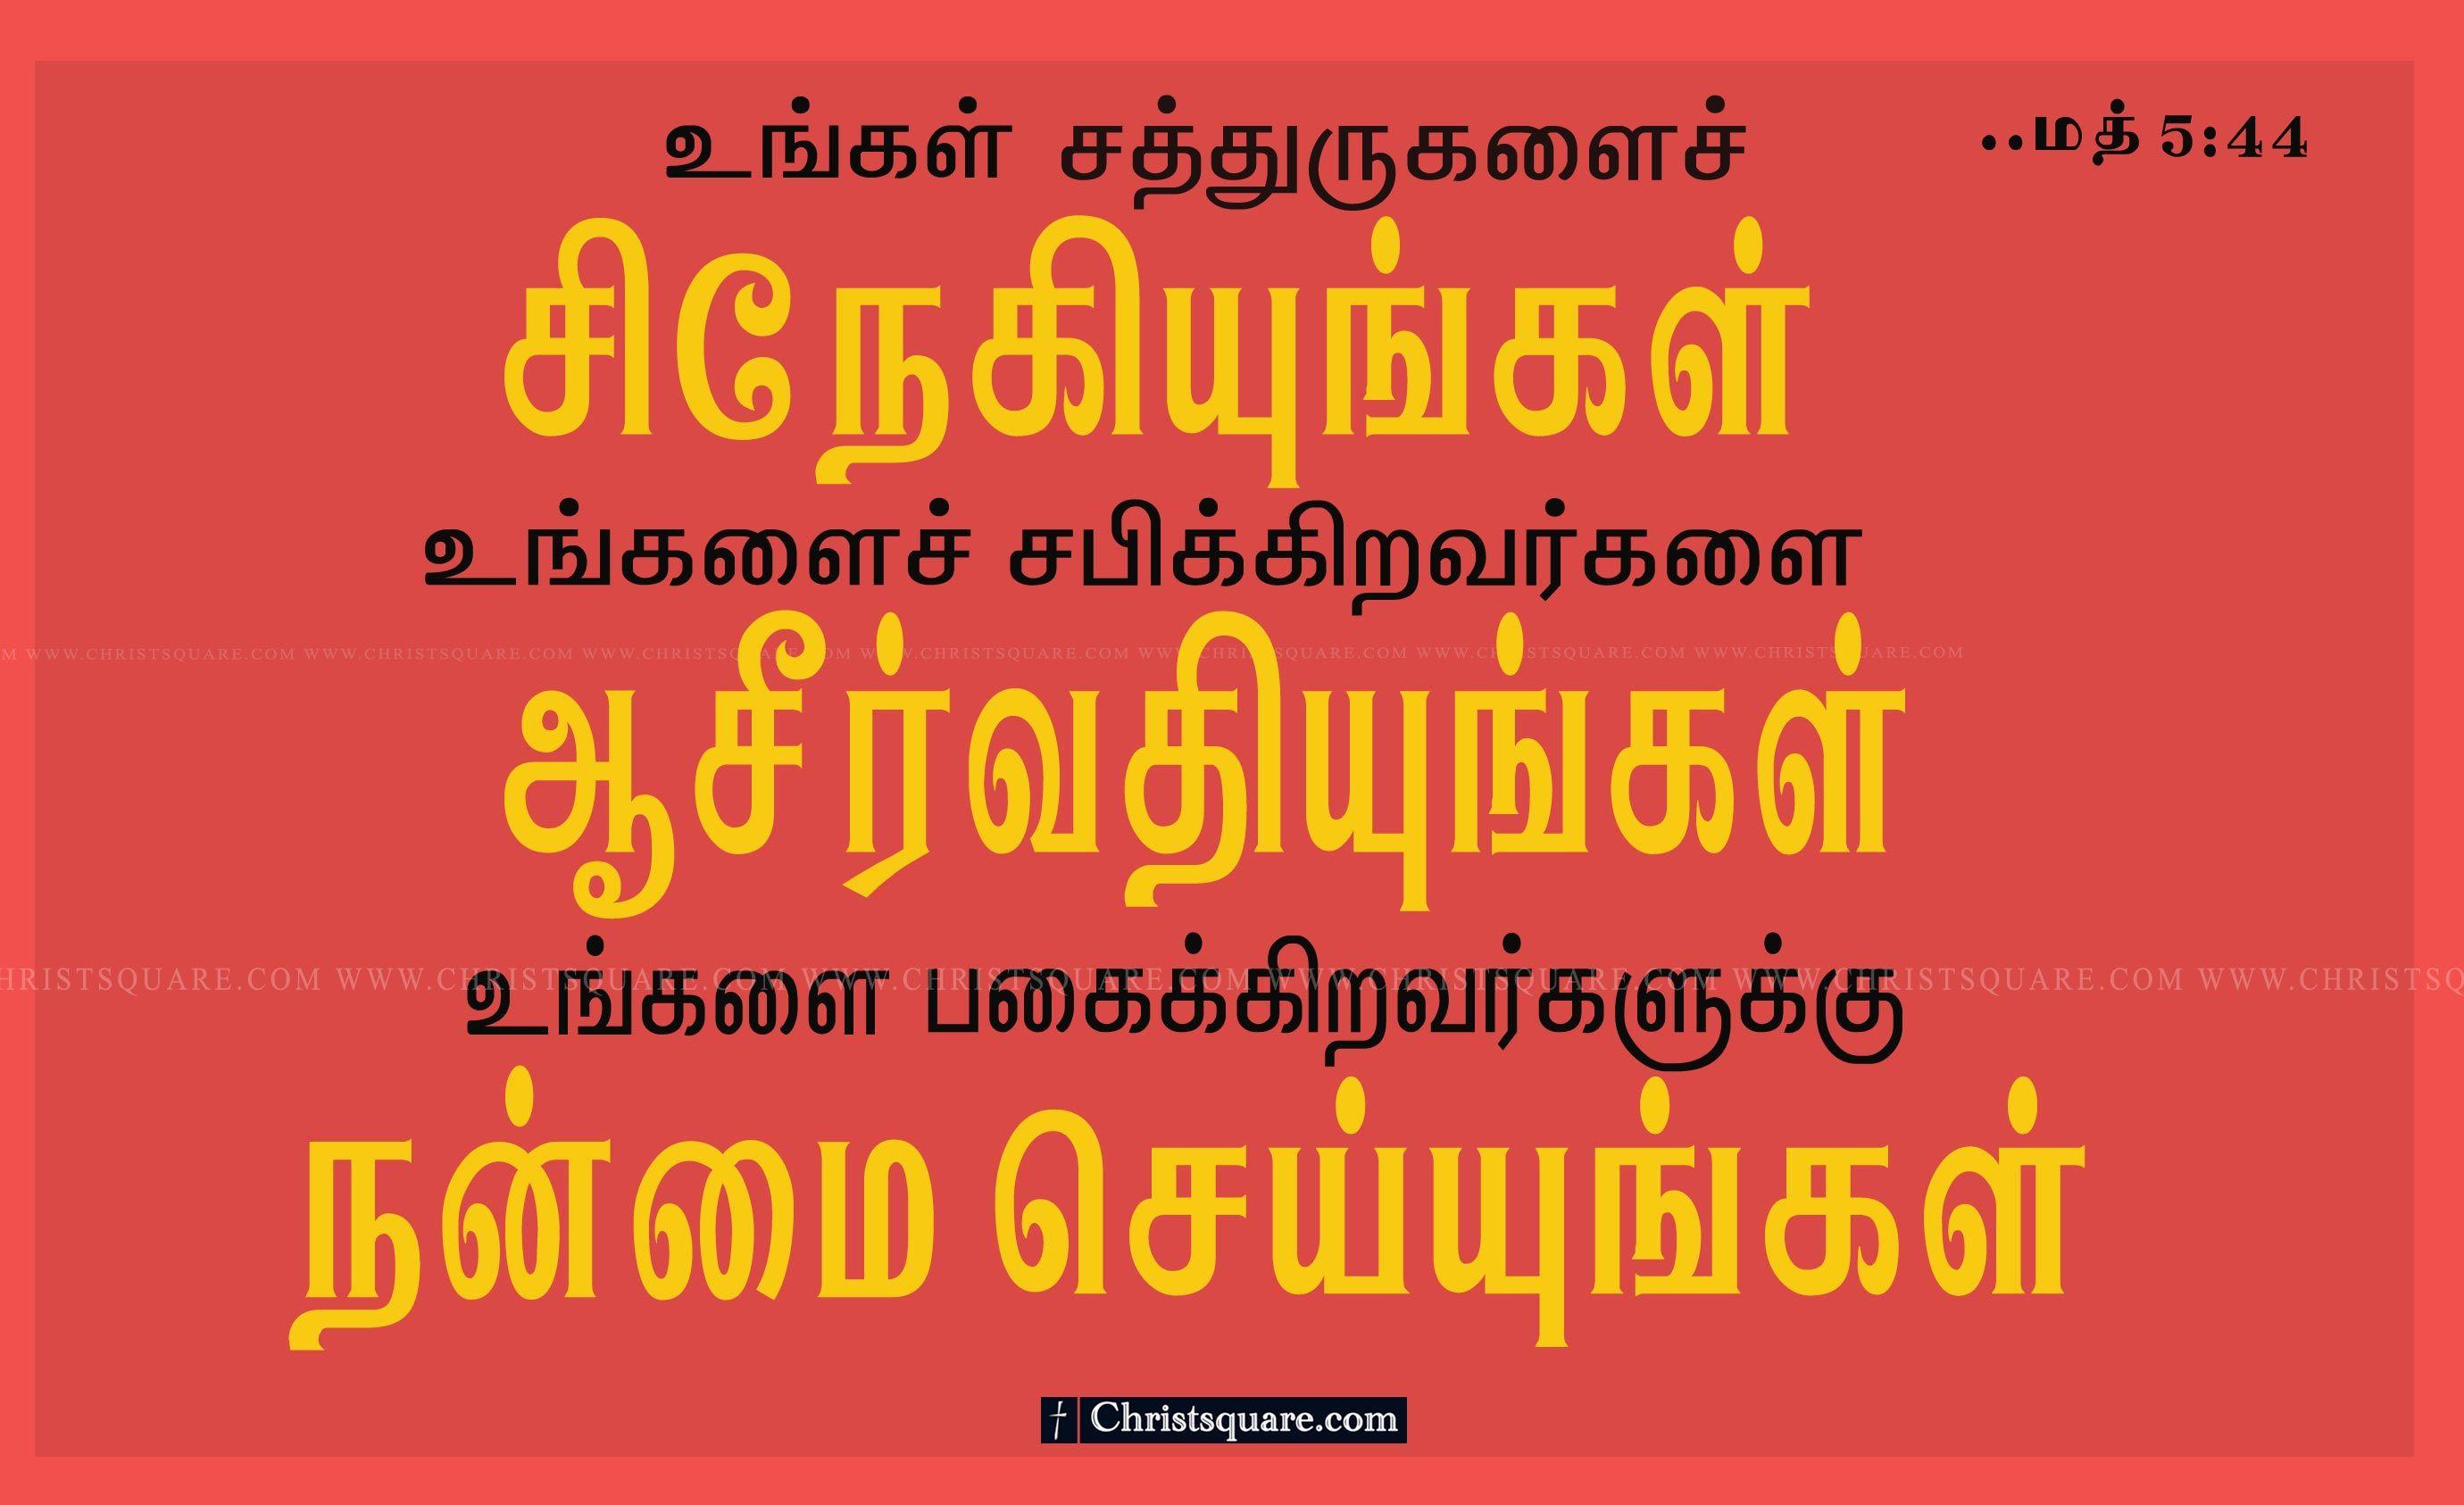 Matthew 5 44 Tamil Bible Words Bible Words Tamil Bible